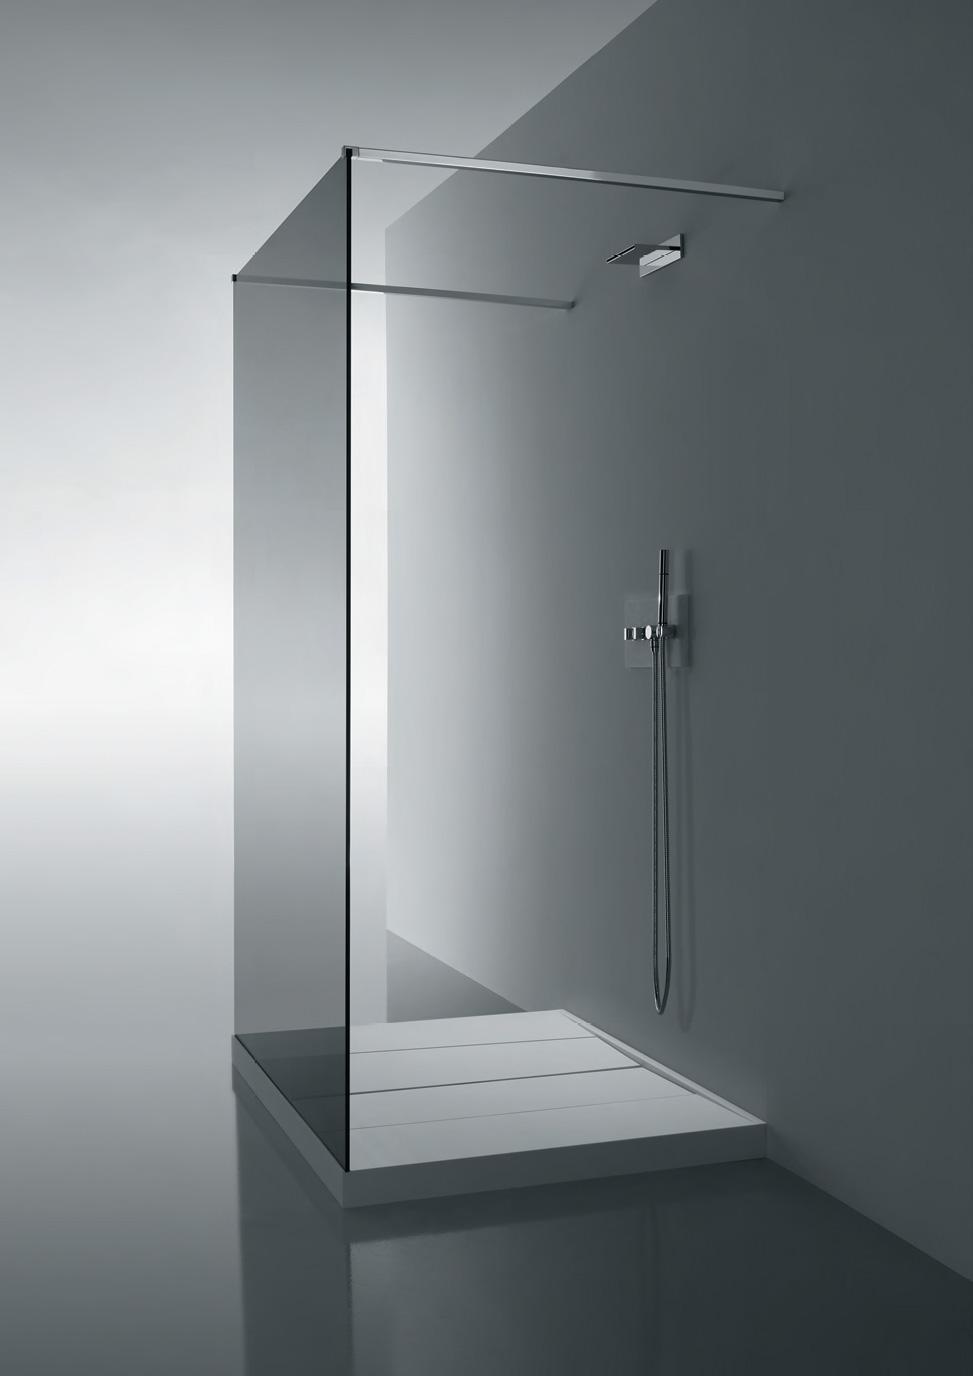 glass wall dividers bathroom photo - 1